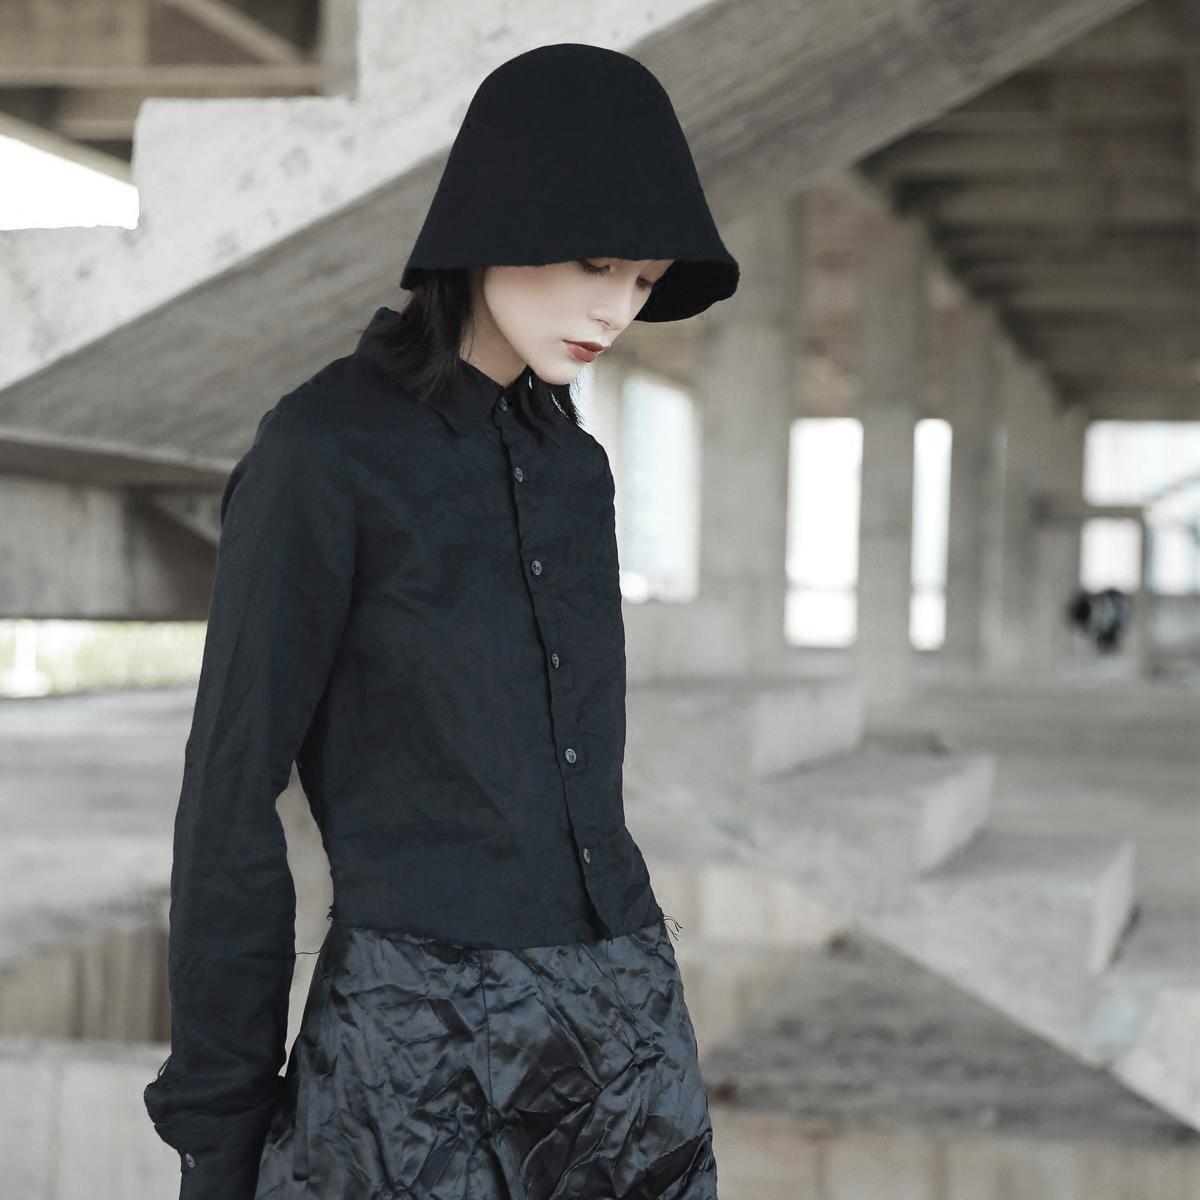 SIMPLE BLACK 暗黑秋冬割边麻料短款修身长袖衬衫